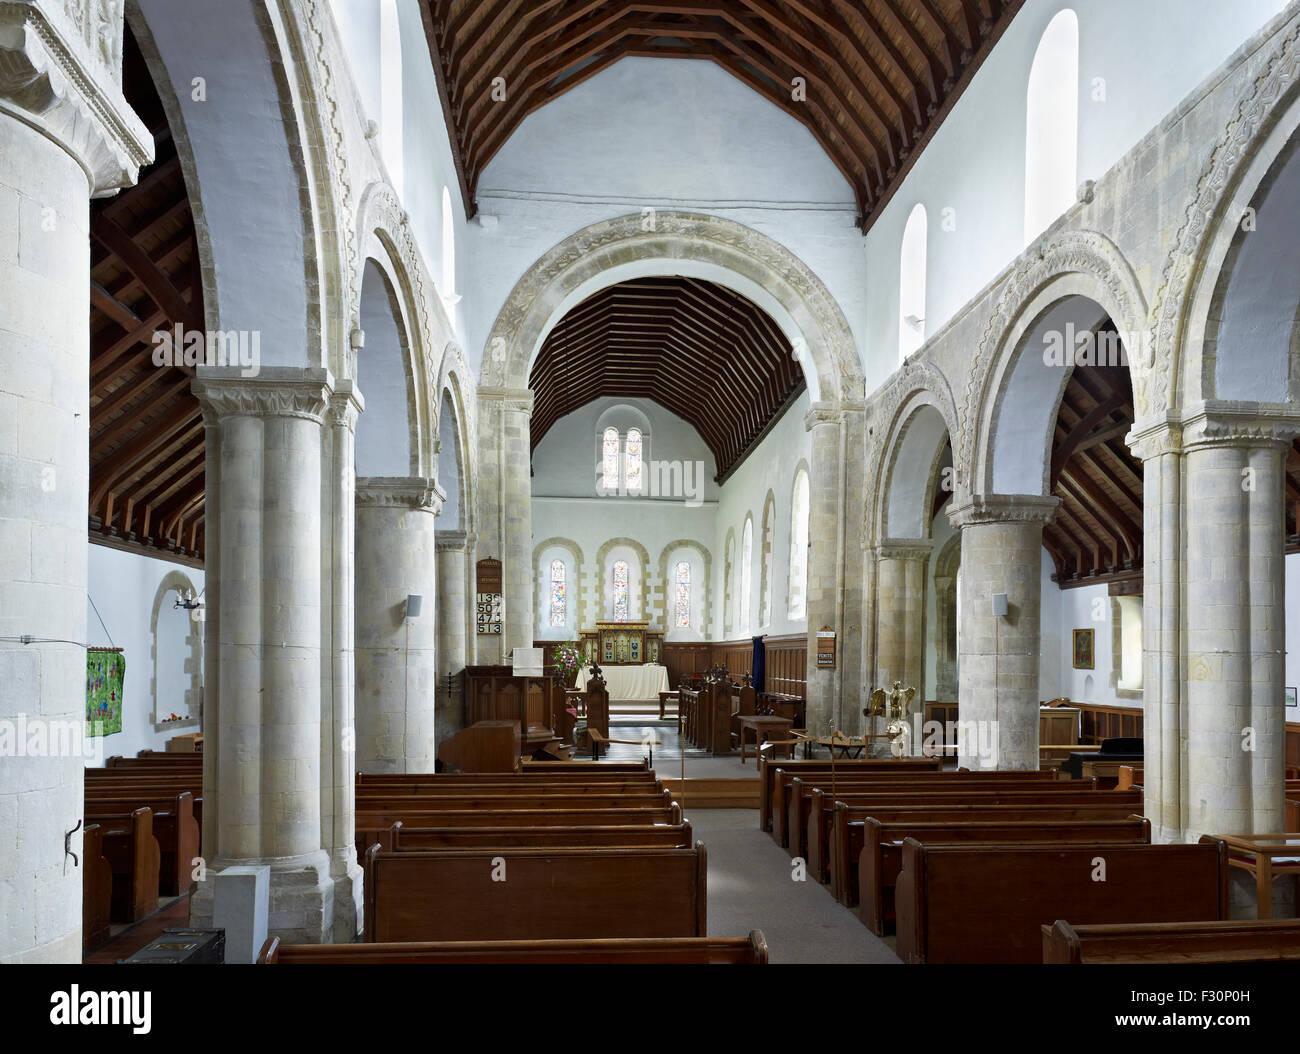 St Martin's at Cliffe. Twelfth century church interior - Stock Image